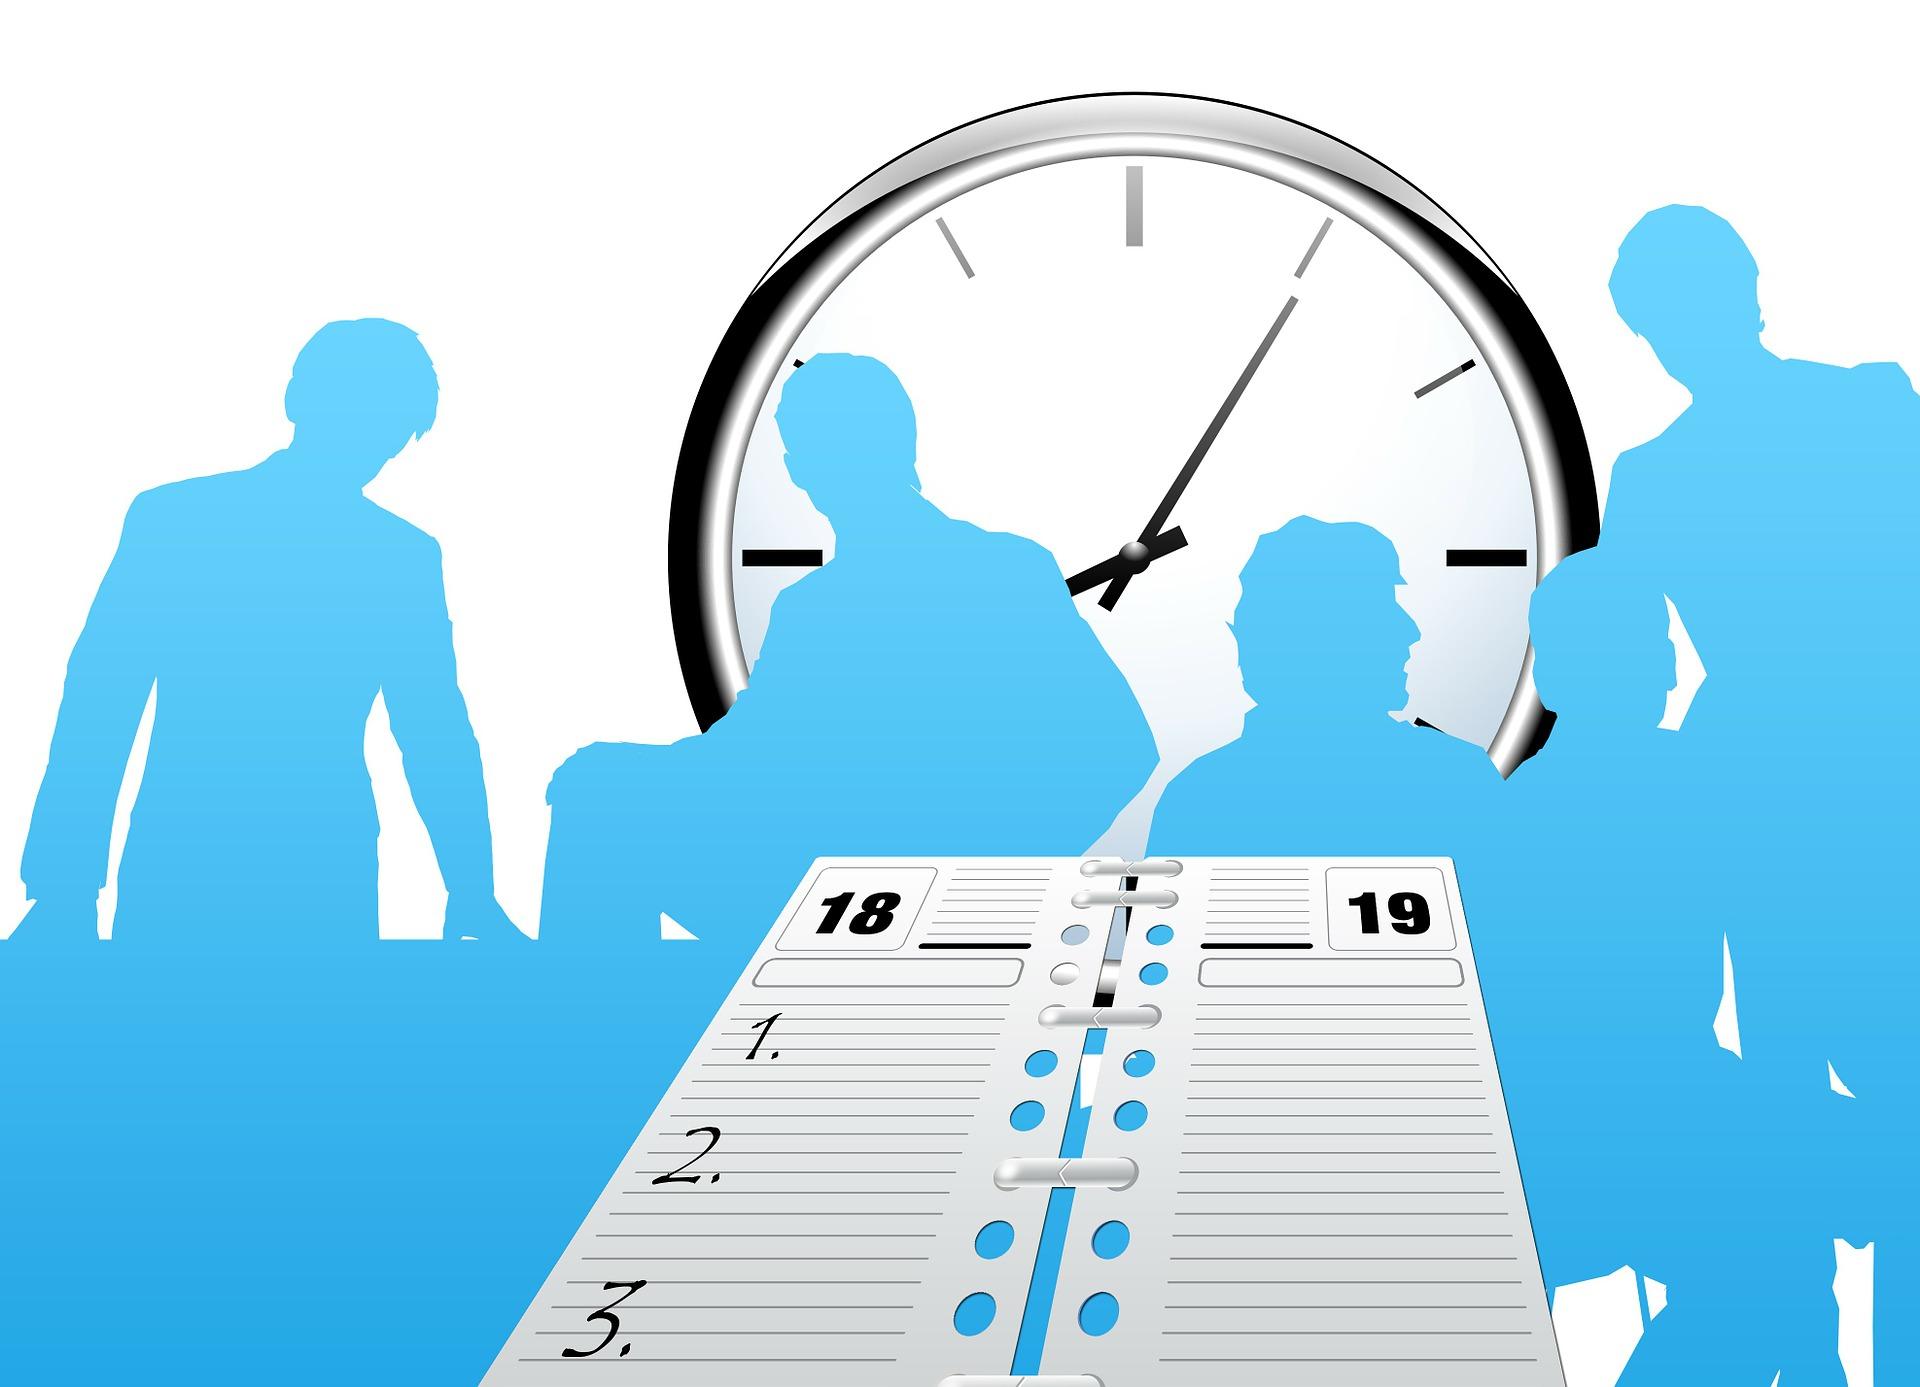 Kurztipp: Kalenderwochen in Outlook anzeigen